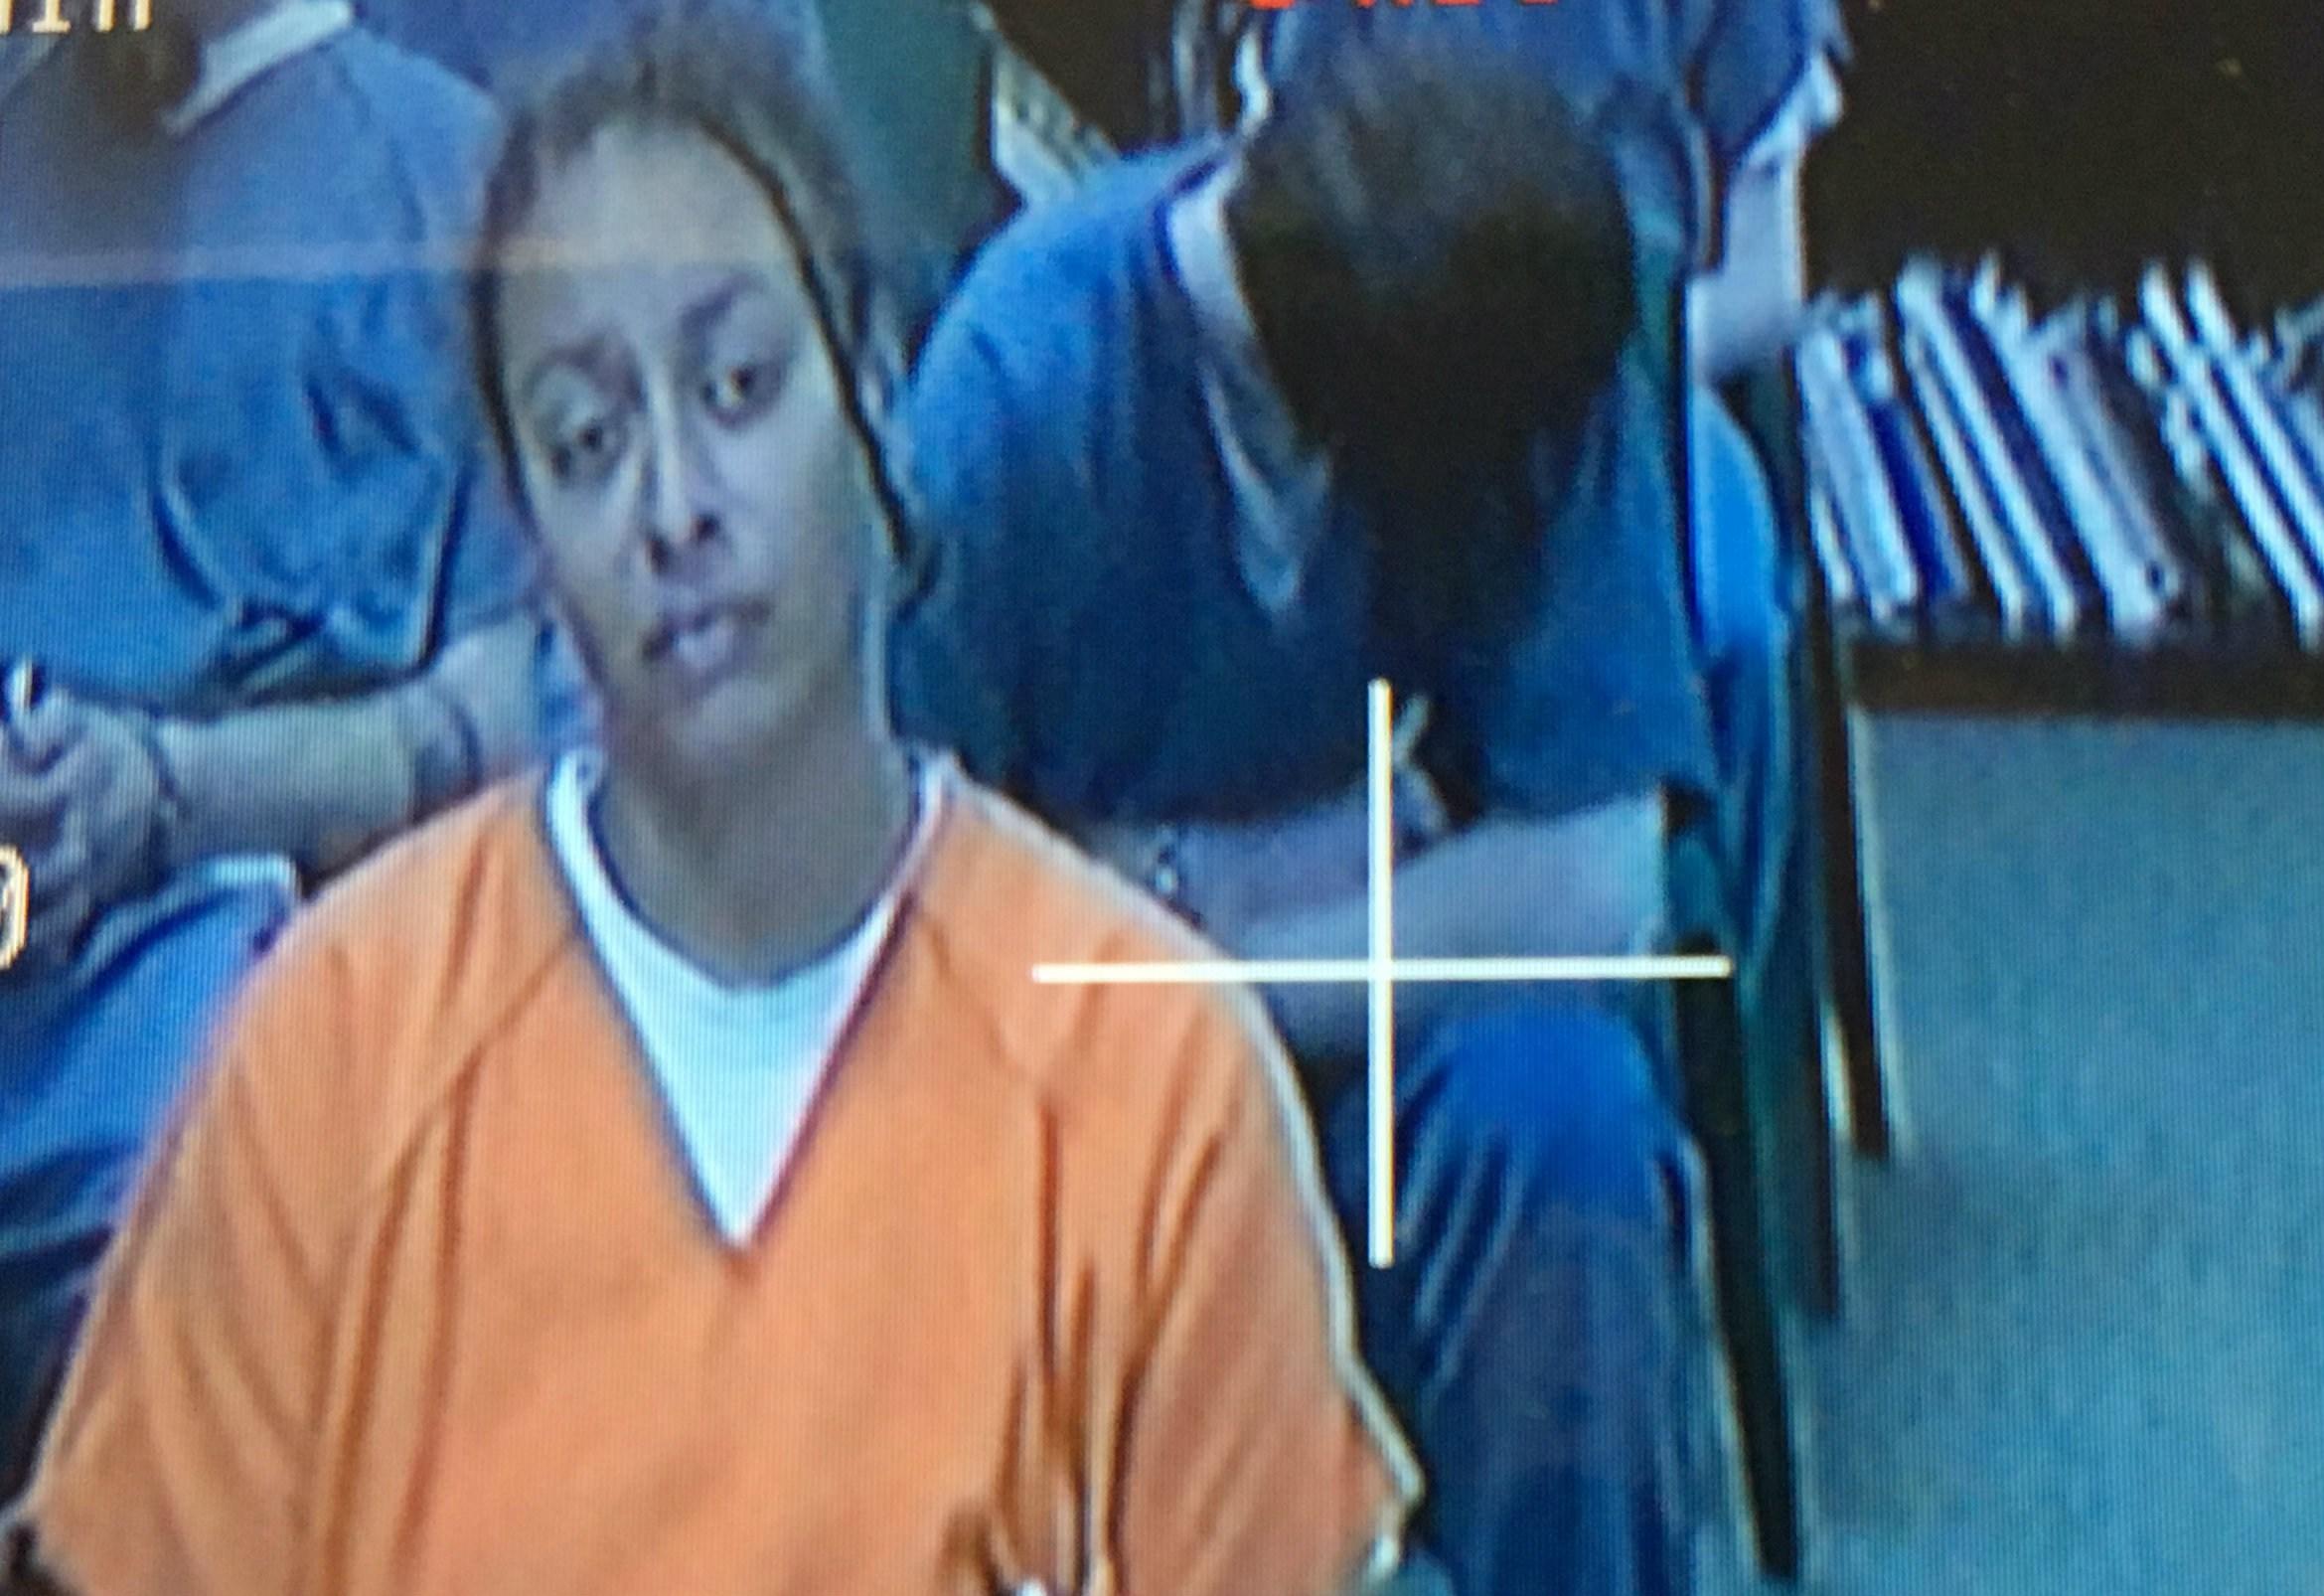 Samantha Adona Meyer, 30, of Salem Ore. was seen in Gallatin County Justice Court